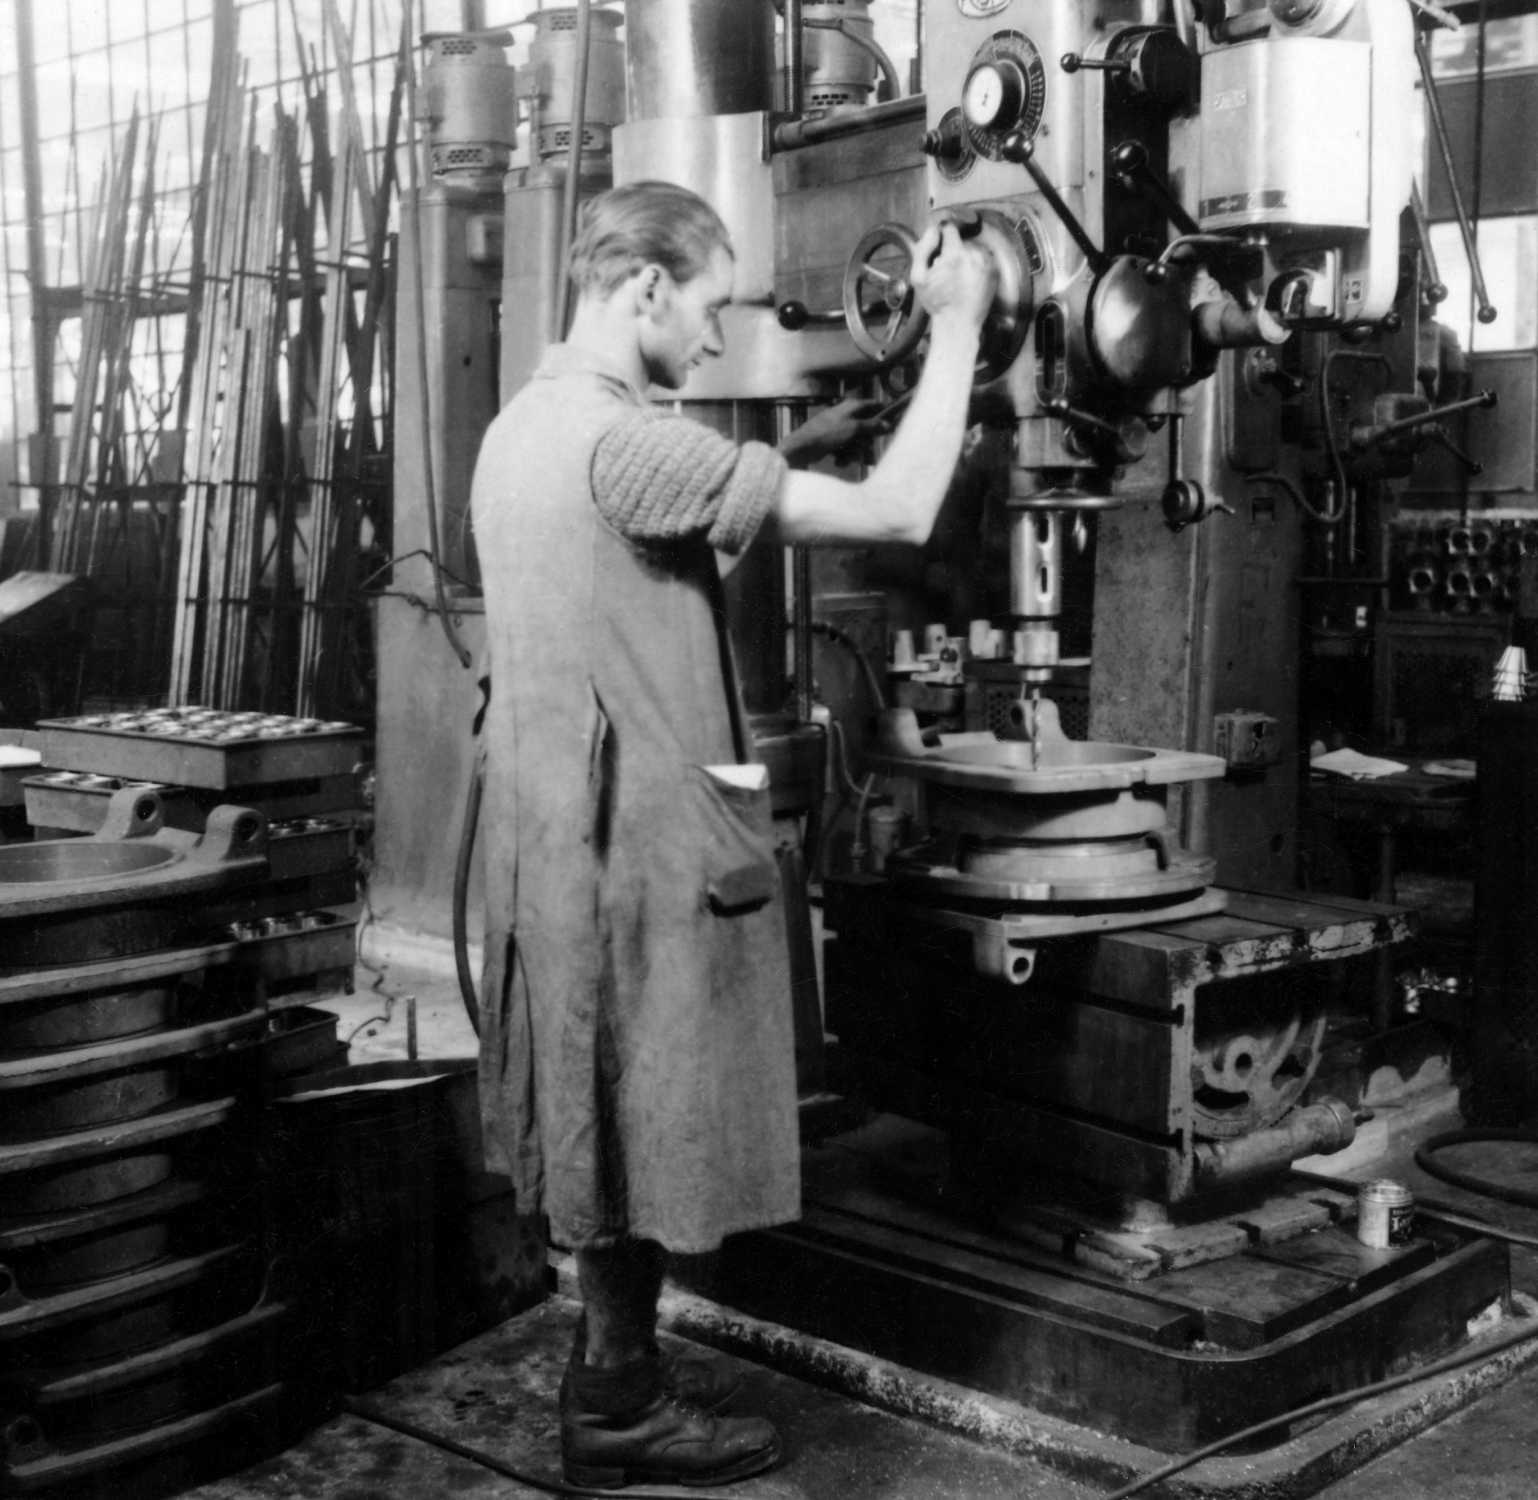 Production of the dough dividing machine (11/2020)